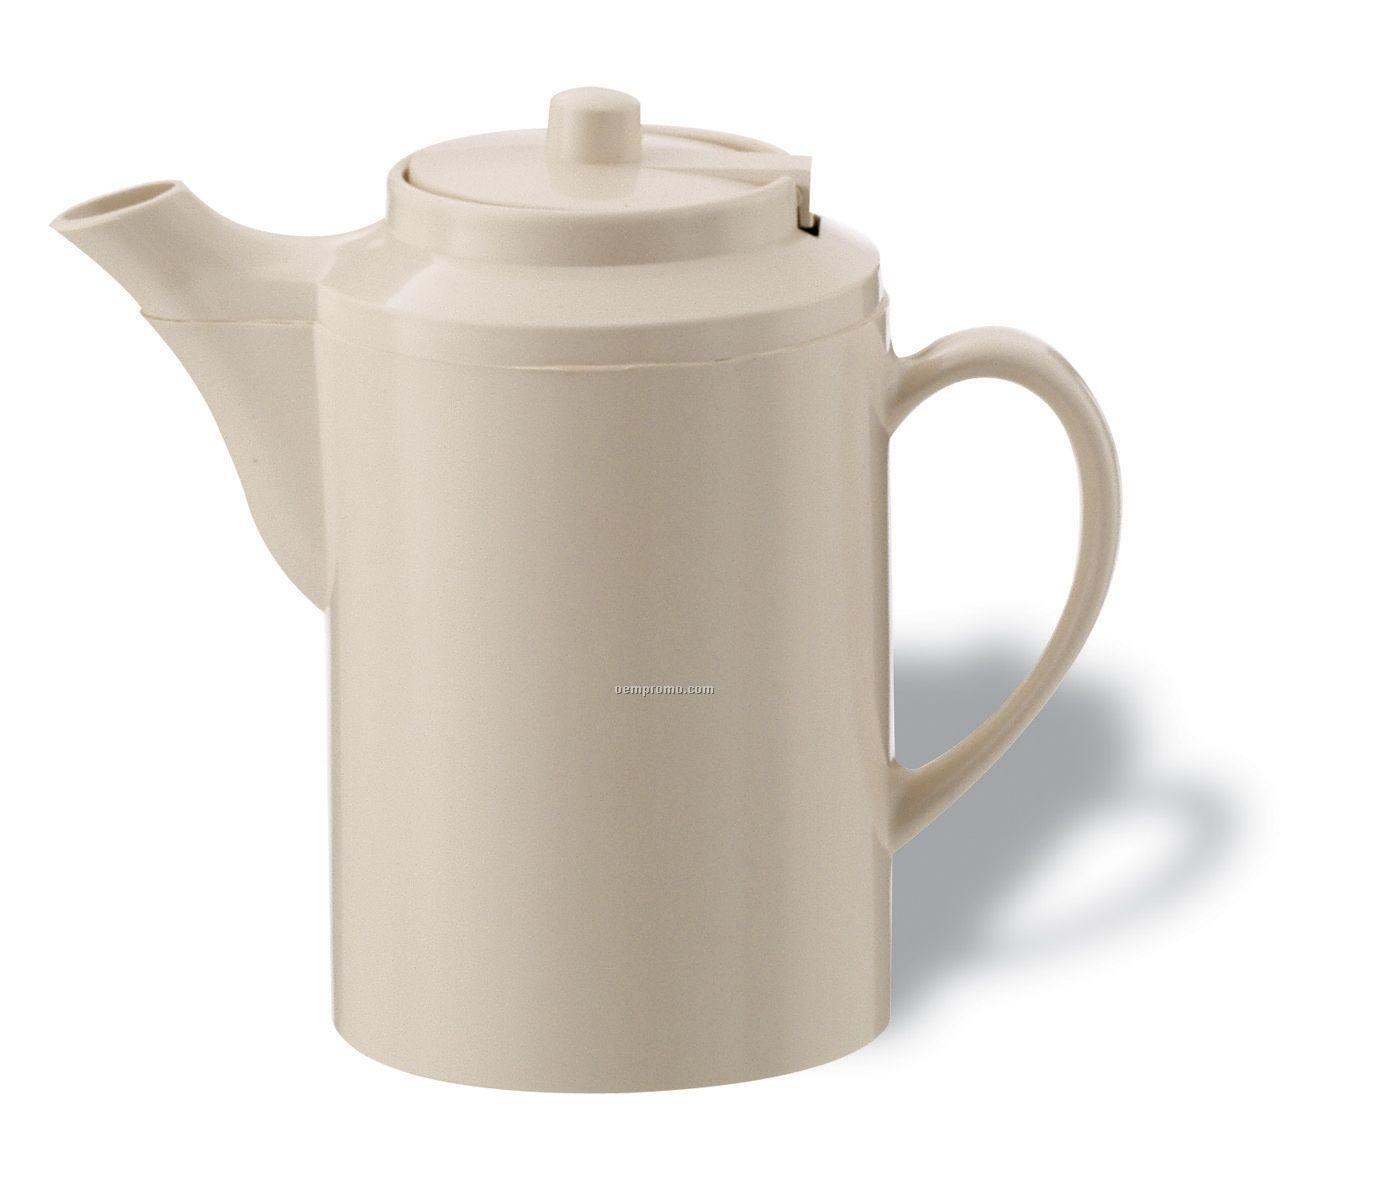 16 Oz Standard Plastic Tea Pot China Wholesale 16 Oz